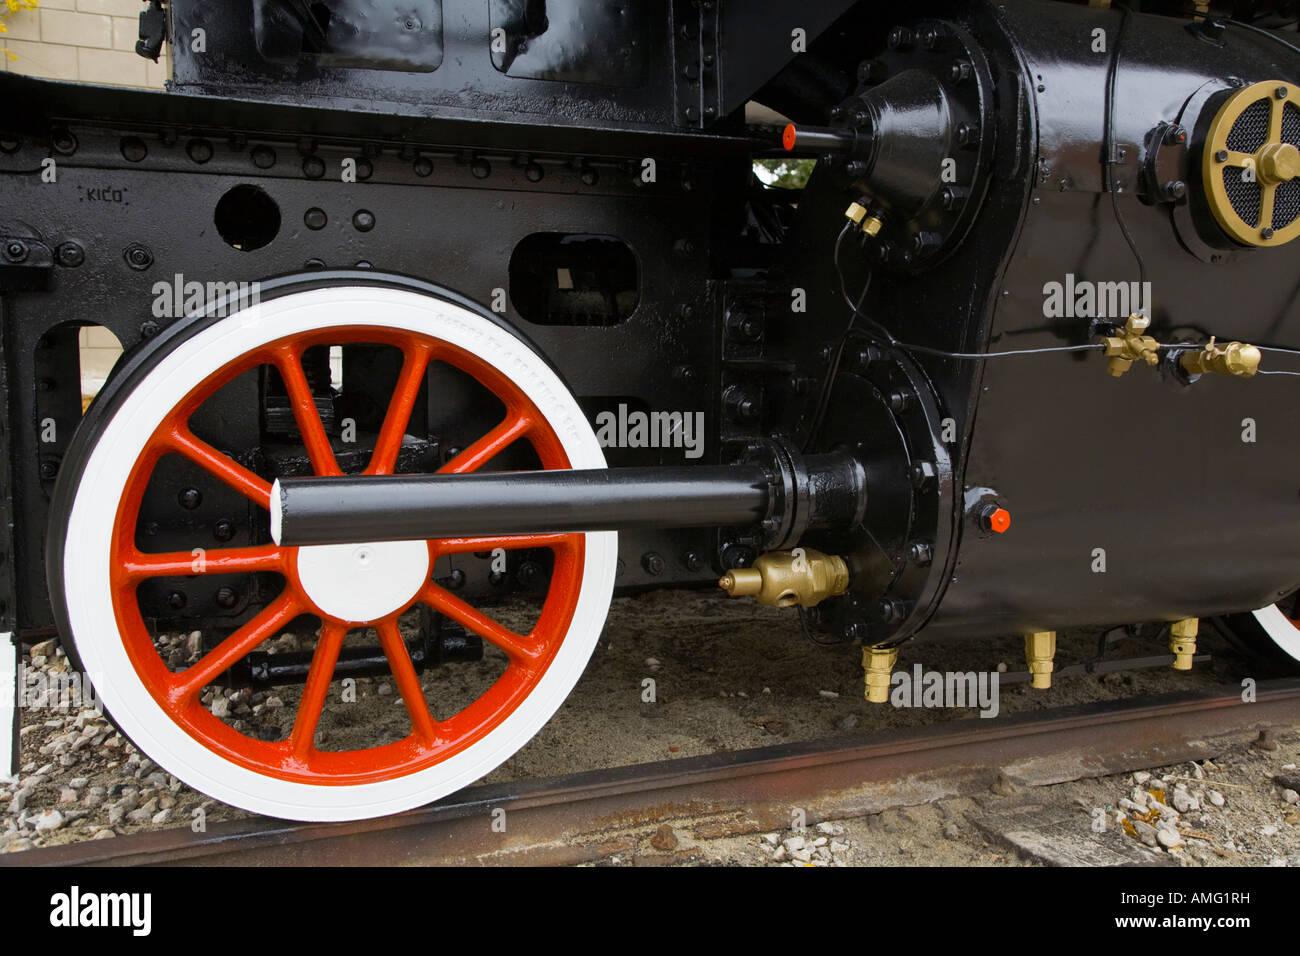 Steam locomotive wheel with piston detail - Stock Image